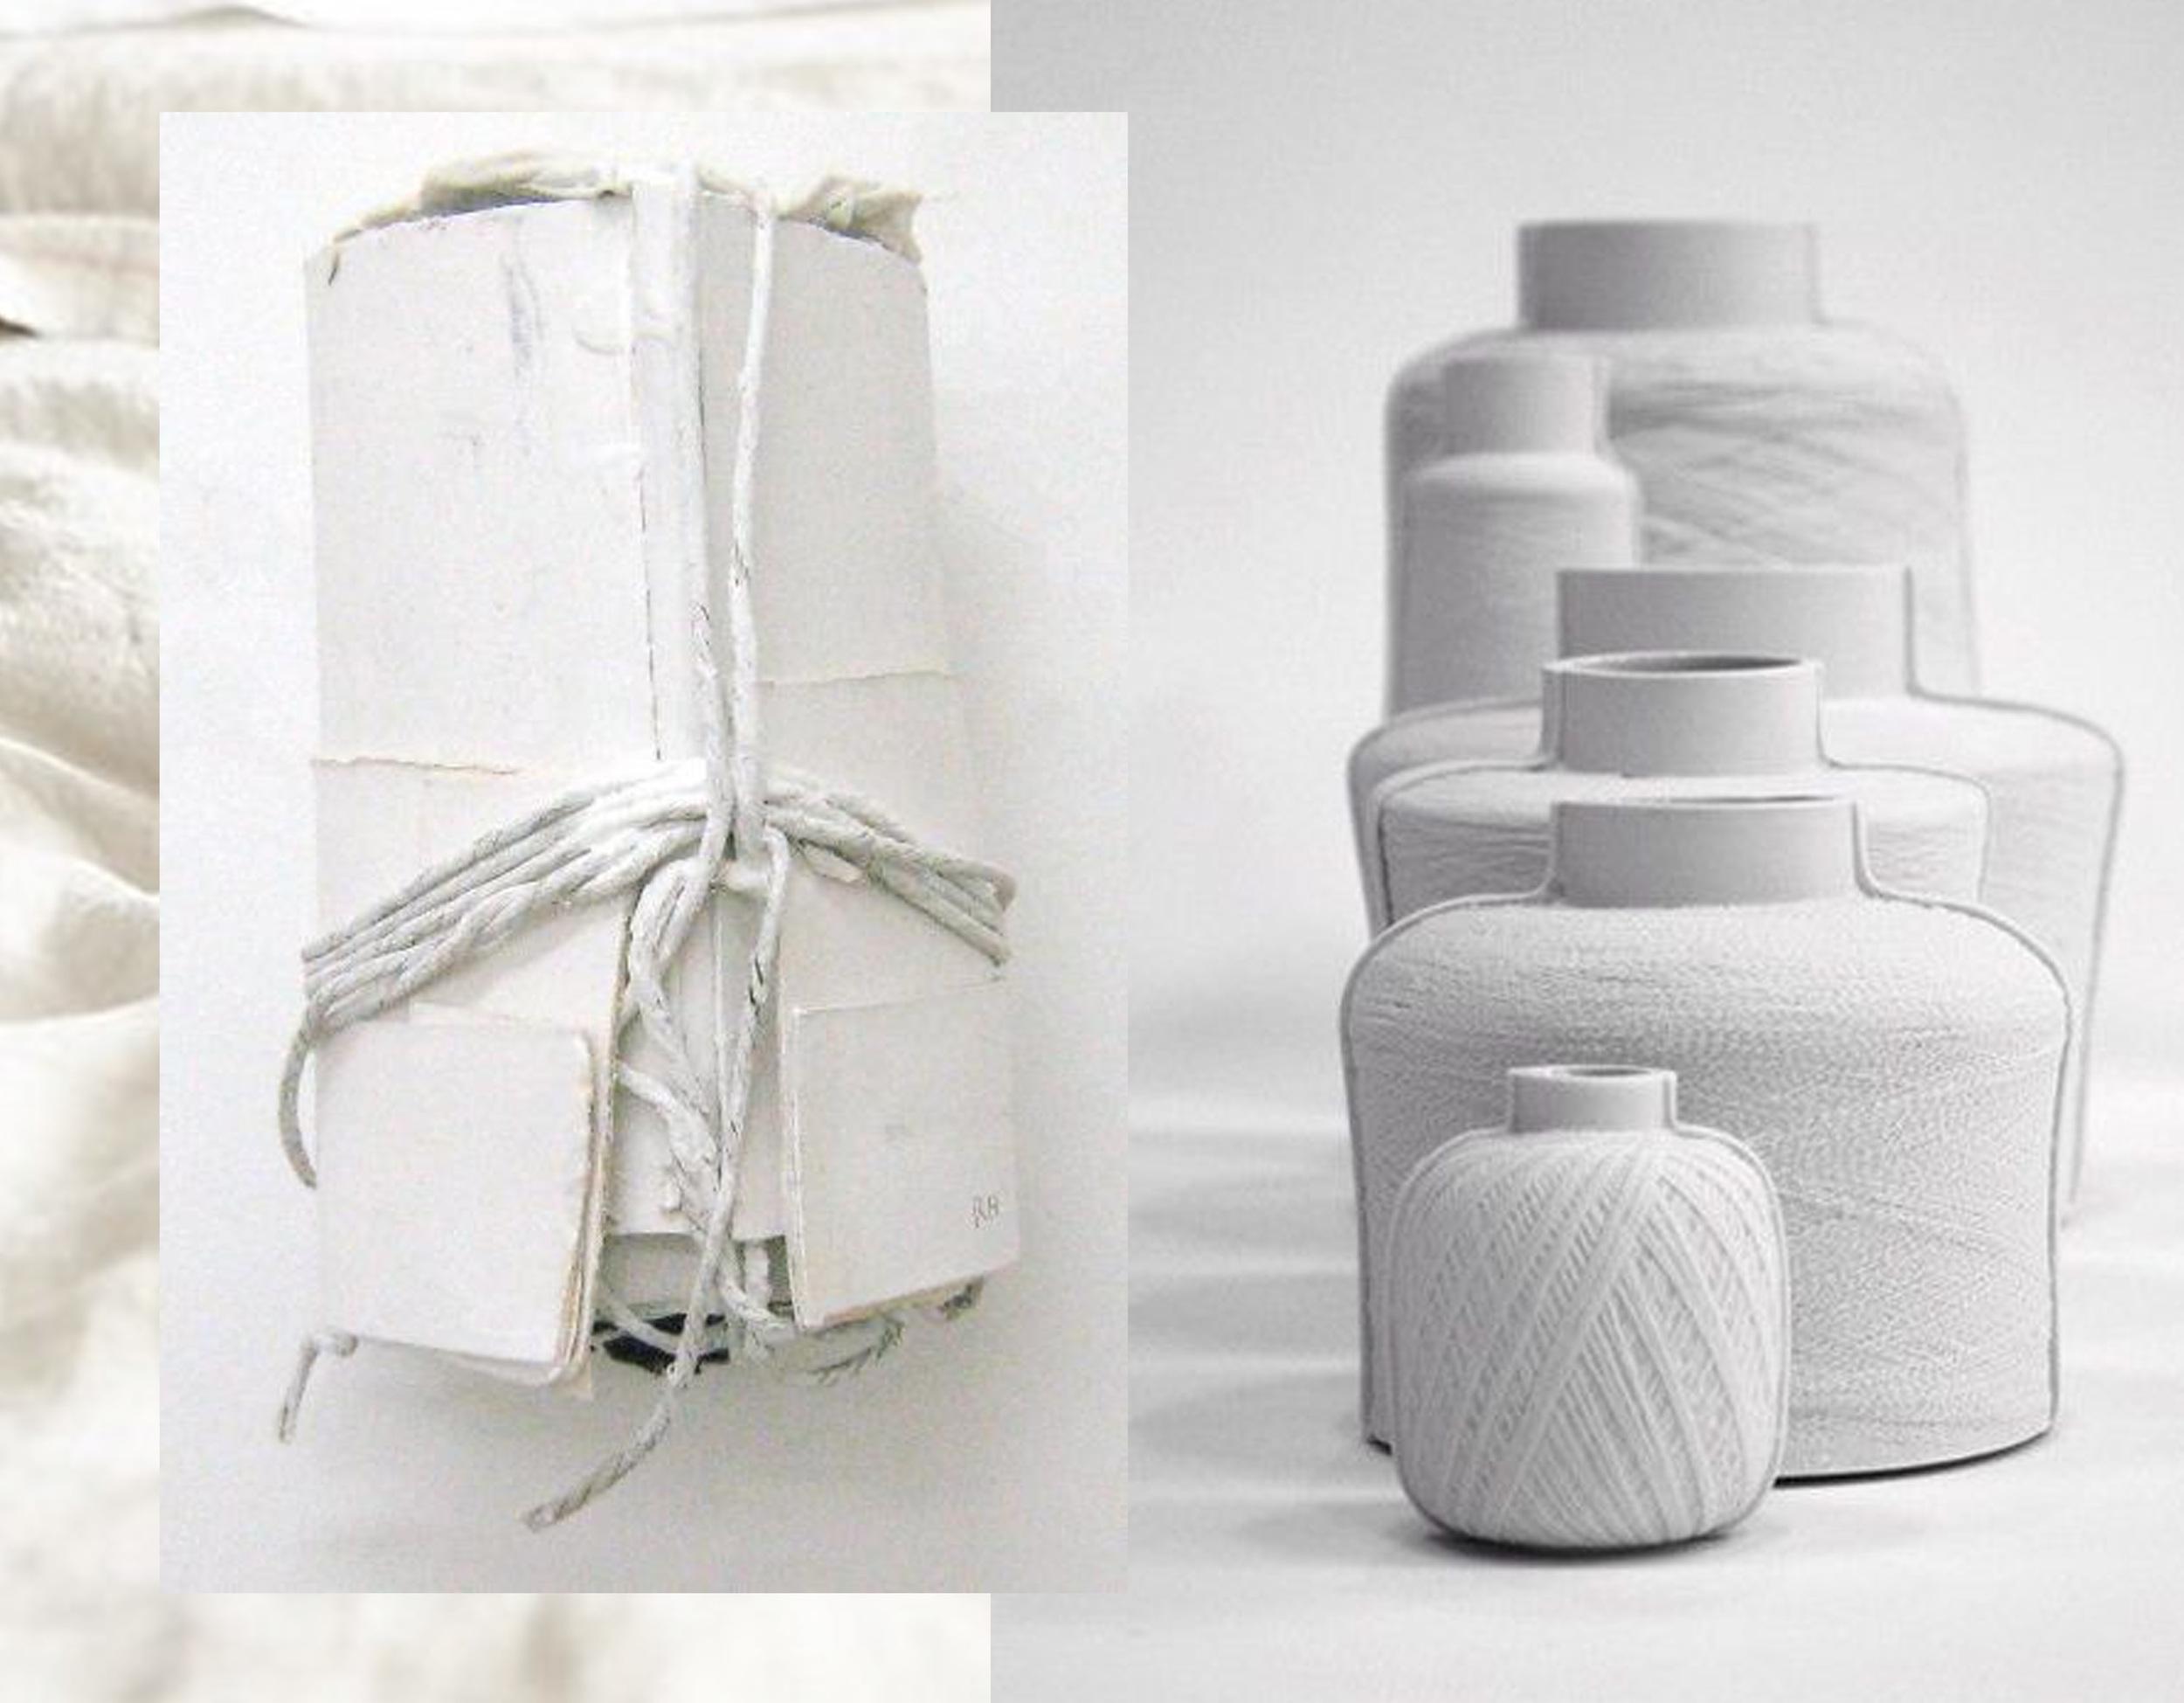 image found on  weissesrauchen  - Spool Vases by Mara Skujeniece  Edwin Pelser